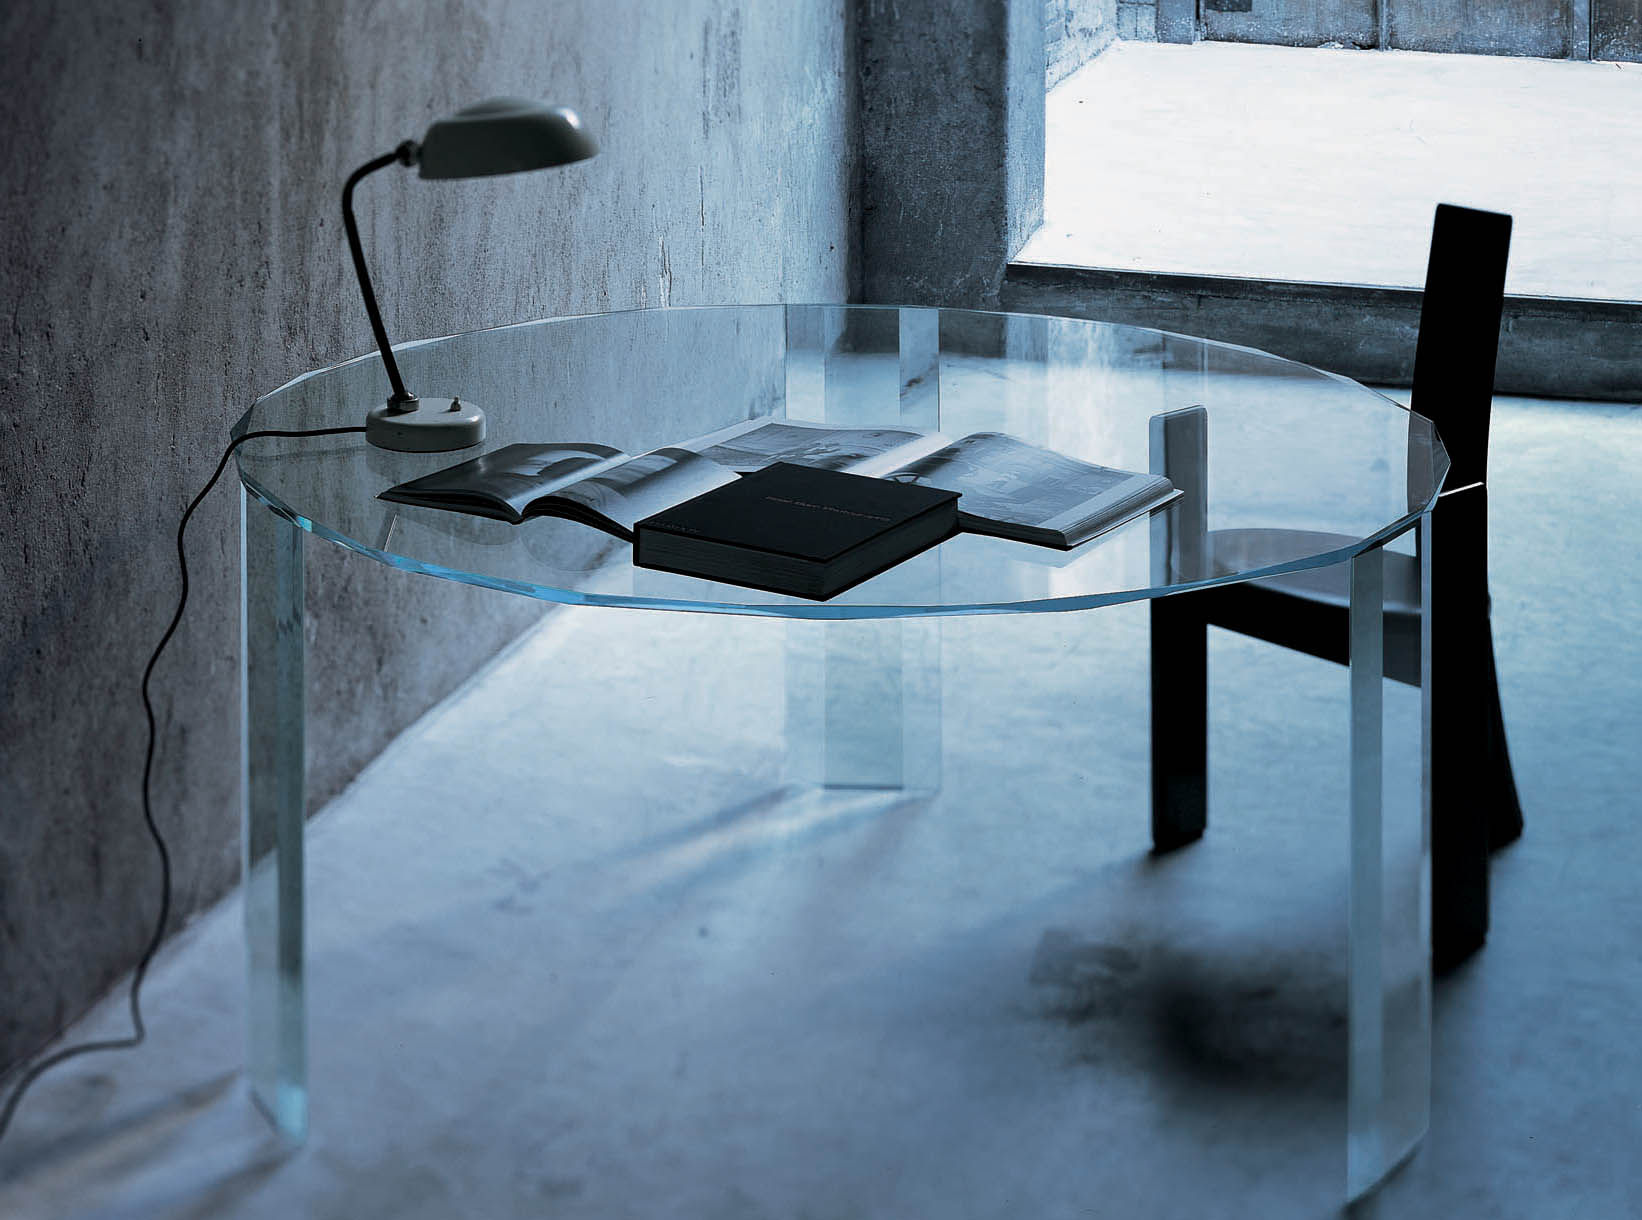 Mobilier - Tables - Table Kooh-I-Noor / Ø 153 cm - Glas Italia - Plateau rond -  Ø153 cm - Verre